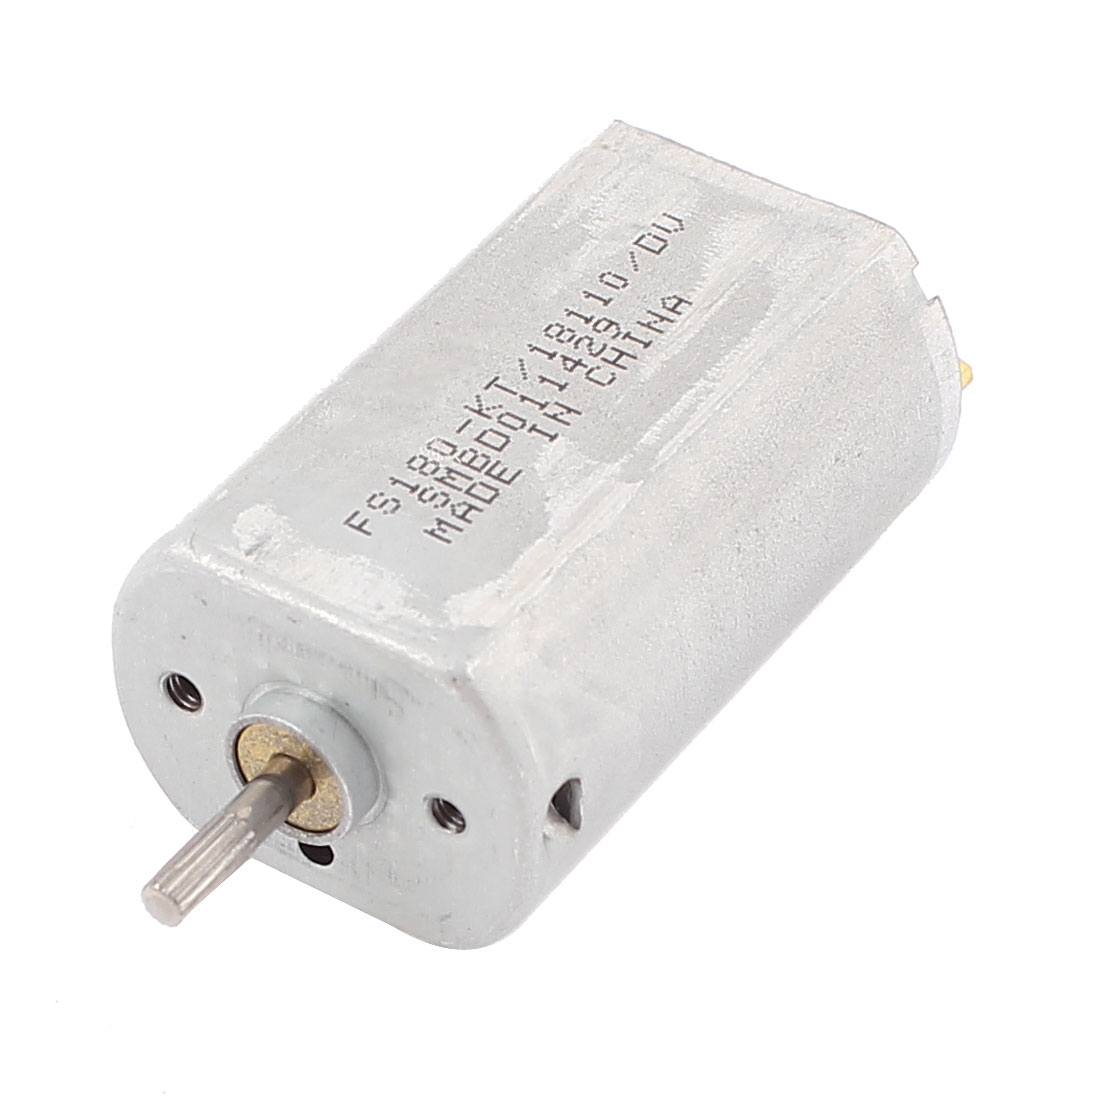 9800-36000RPM-3-12V-High-Torque-Magnetic-Miniature-DC-Motor